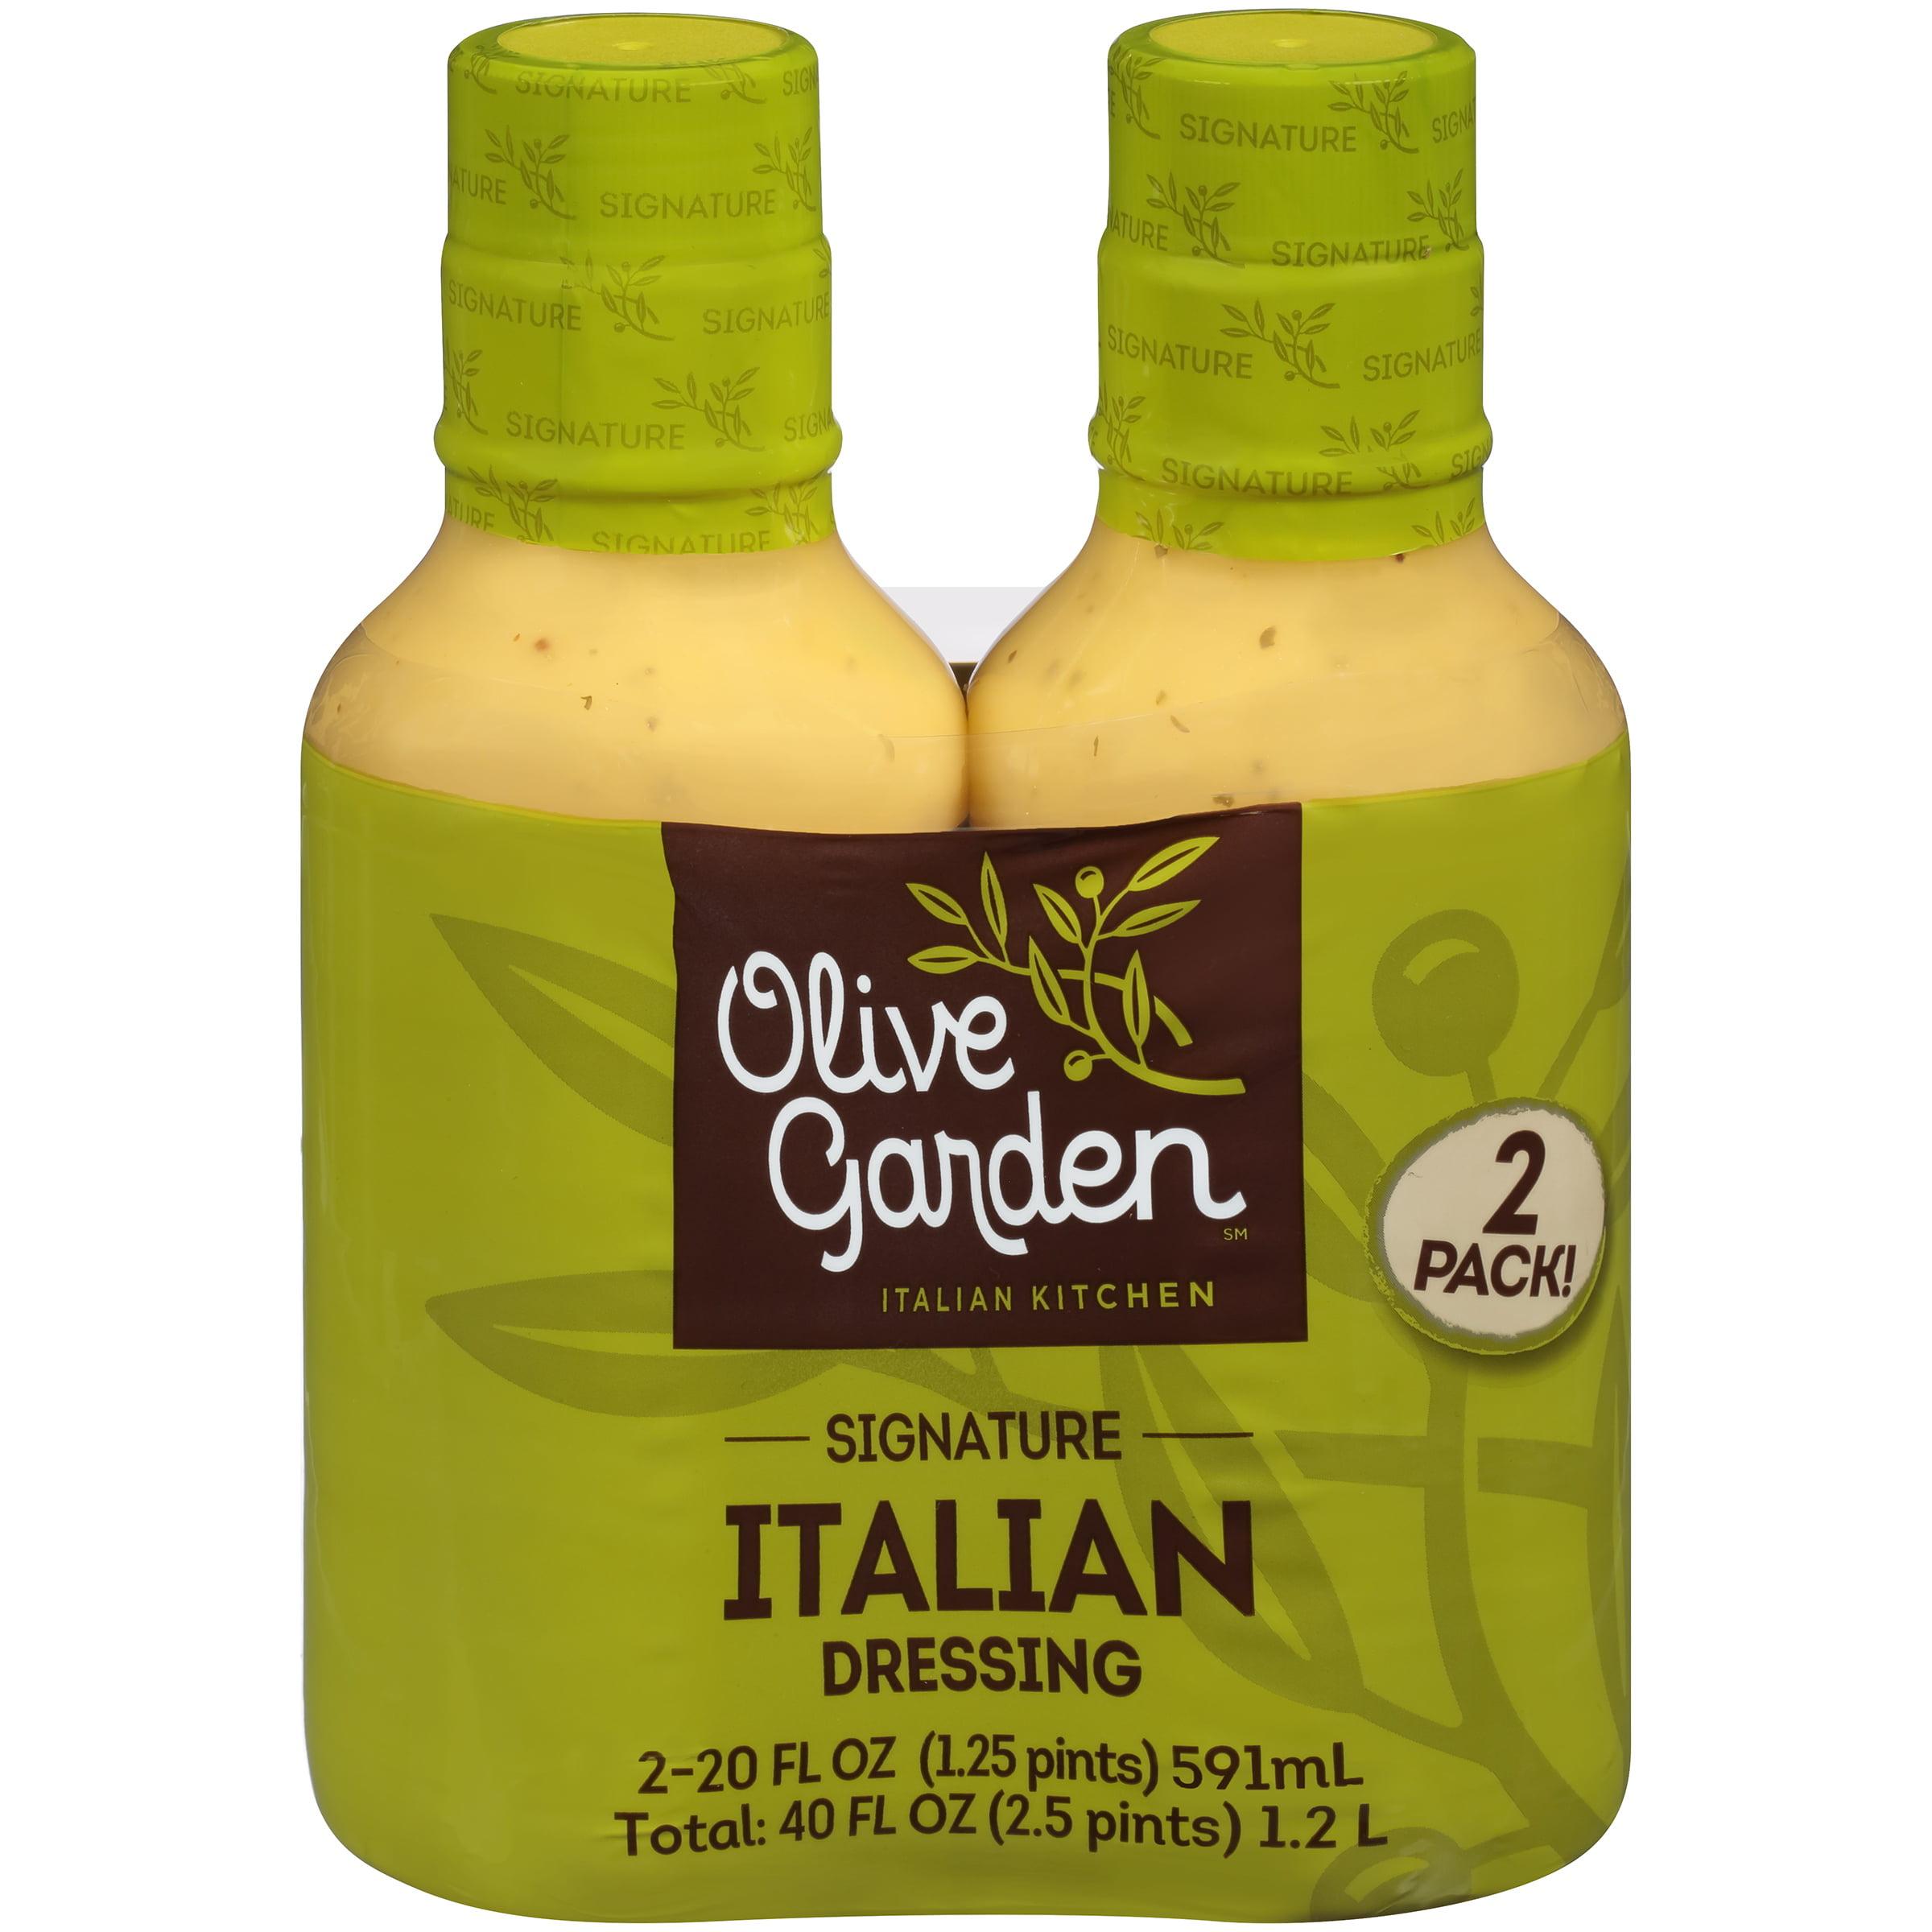 Olive Garden℠ Italian Kitchen Signature Italian Dressing 2-20 fl. oz ...